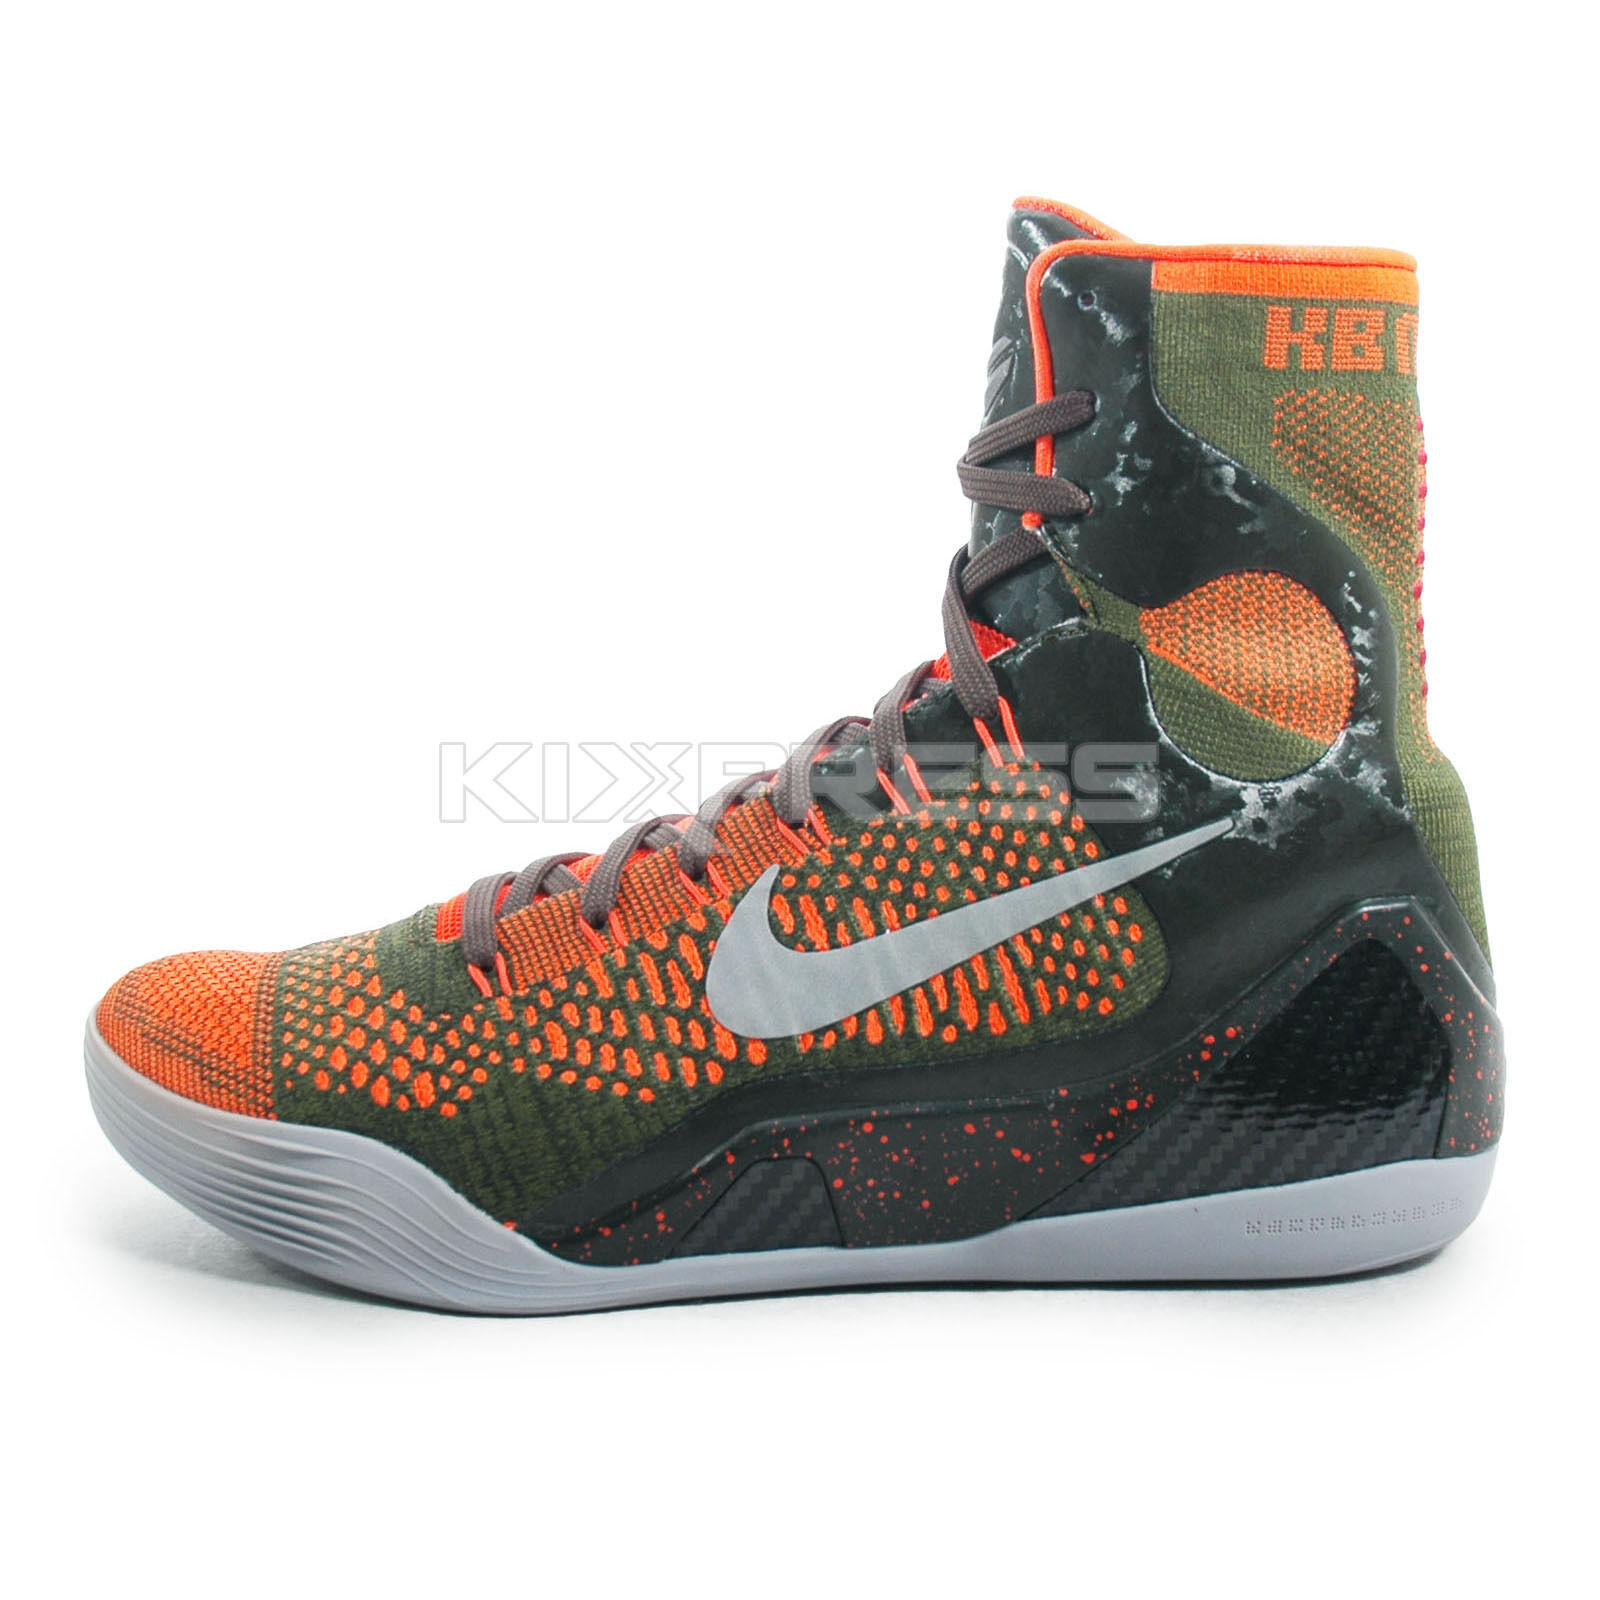 c1e97eace1b2 80%OFF Nike Kobe IX Elite XDR  641714-303  Basketball Strategy Sequoia